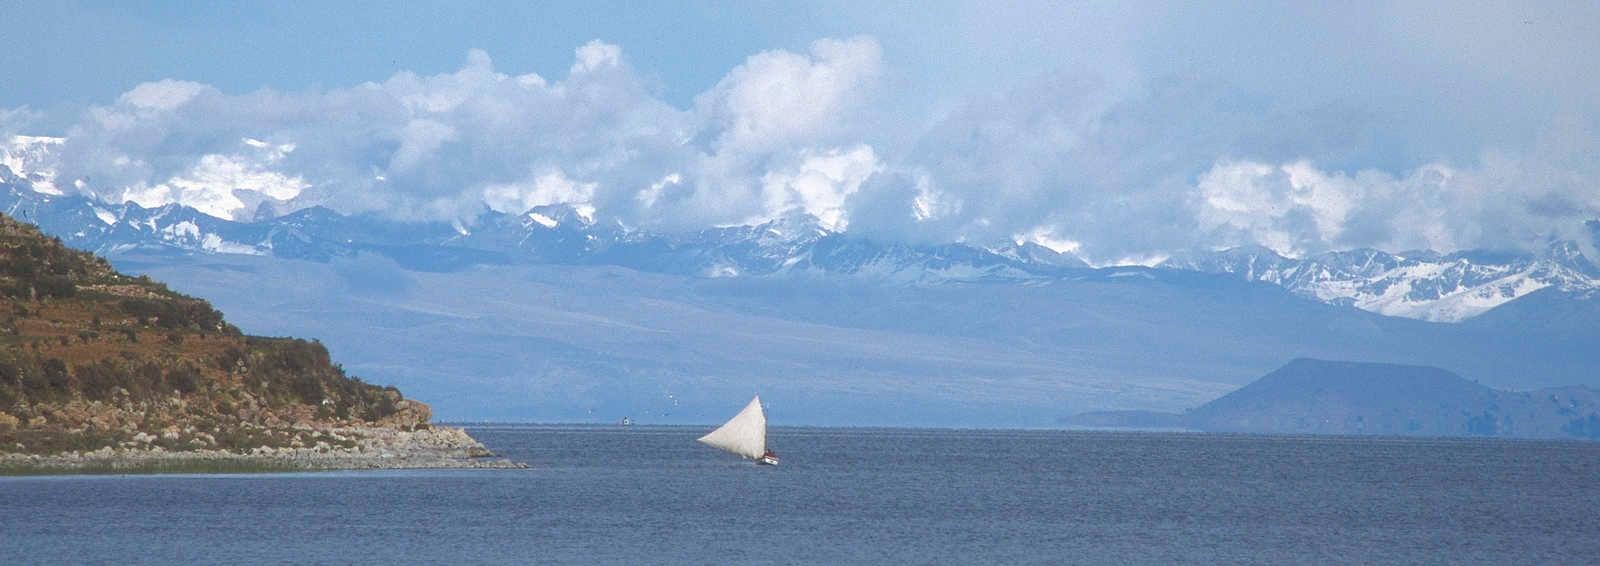 Sailboat by Island of Sun, Lake Titicaca. Cordillera Real behind.